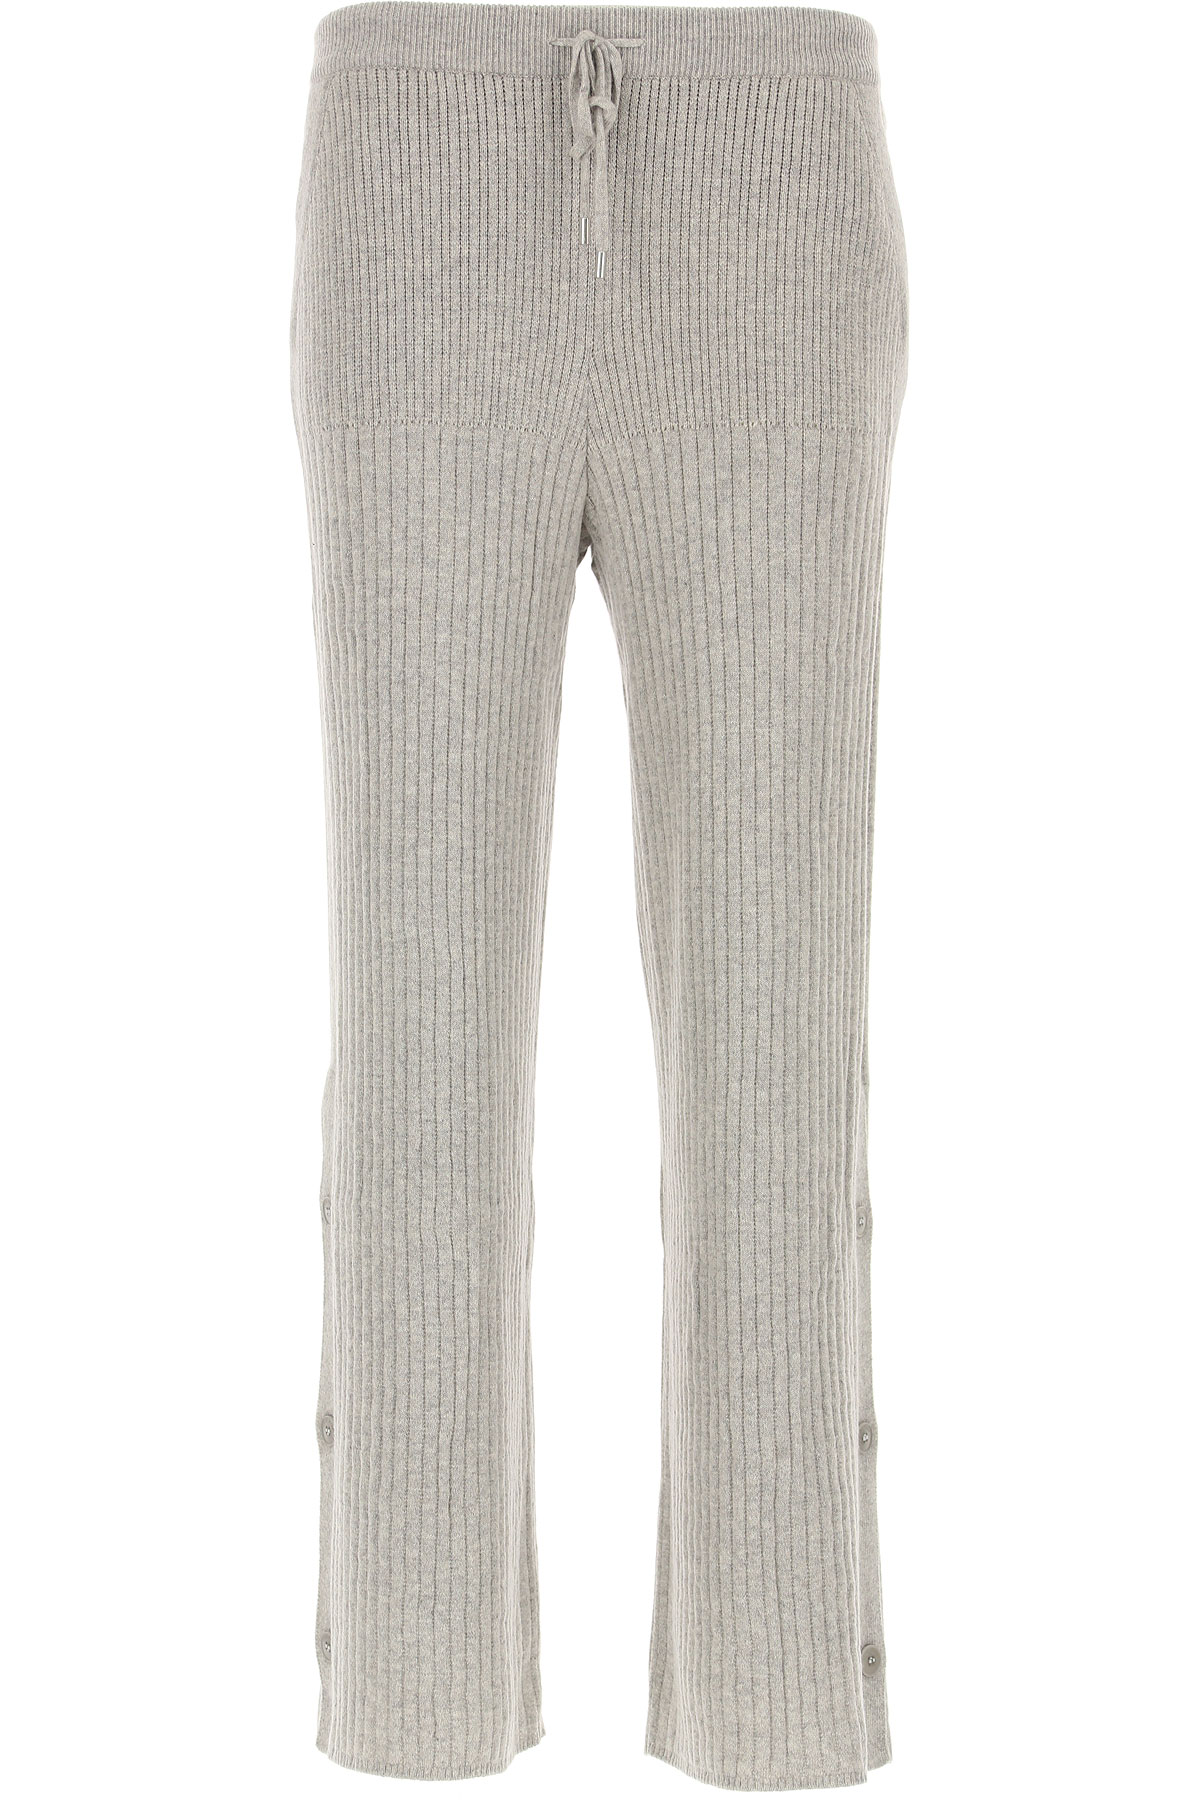 Image of Loro Piana Sweater for Women Jumper, Grey, Cashemere, 2017, 4 6